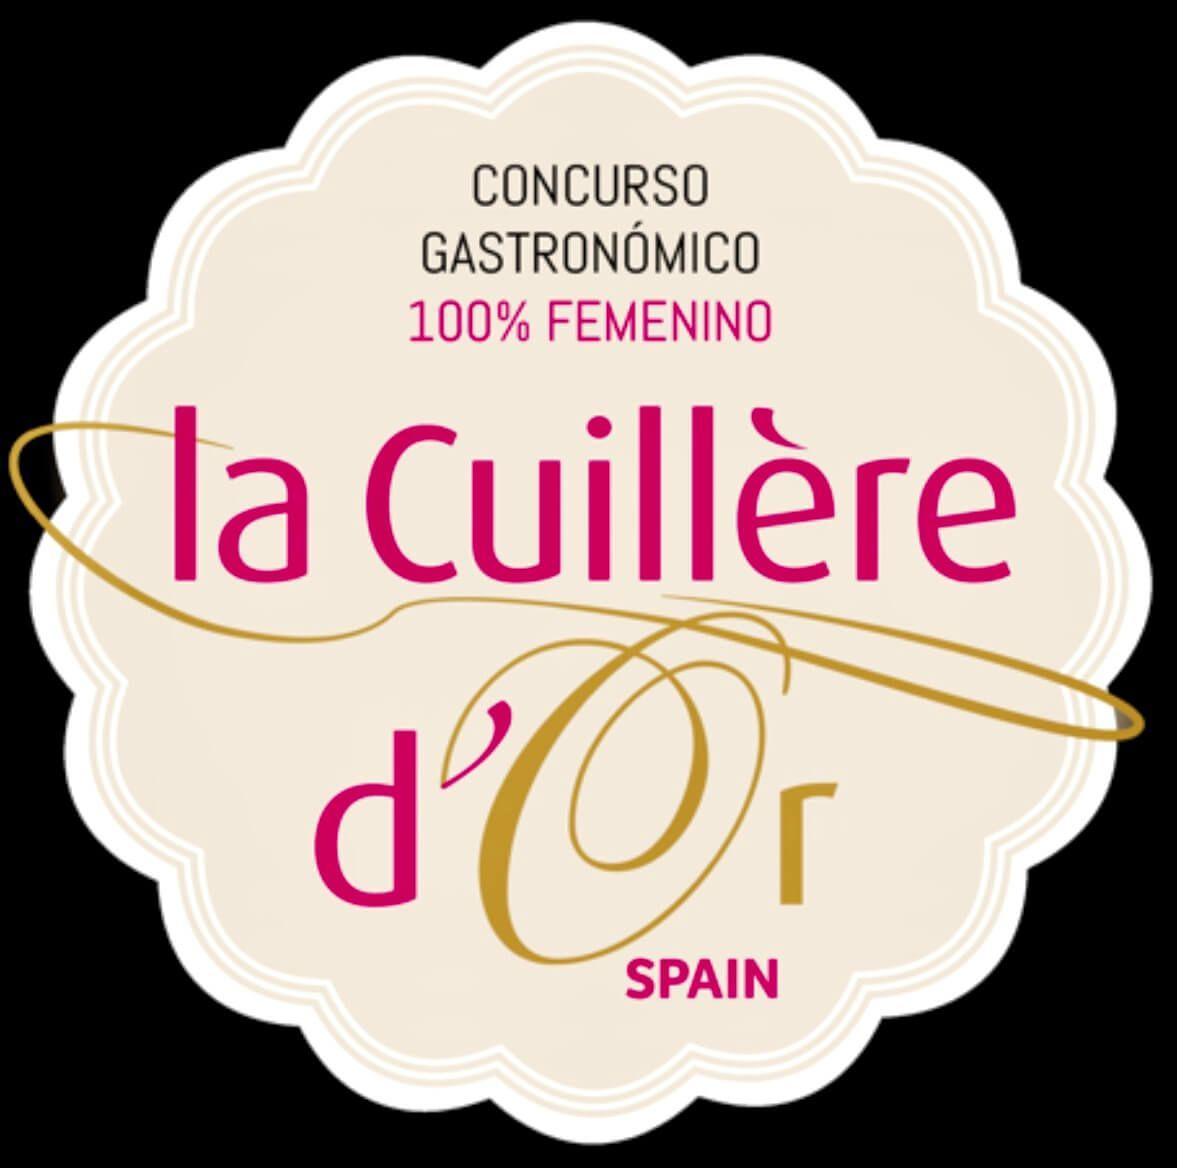 La Cuillère D'Or España